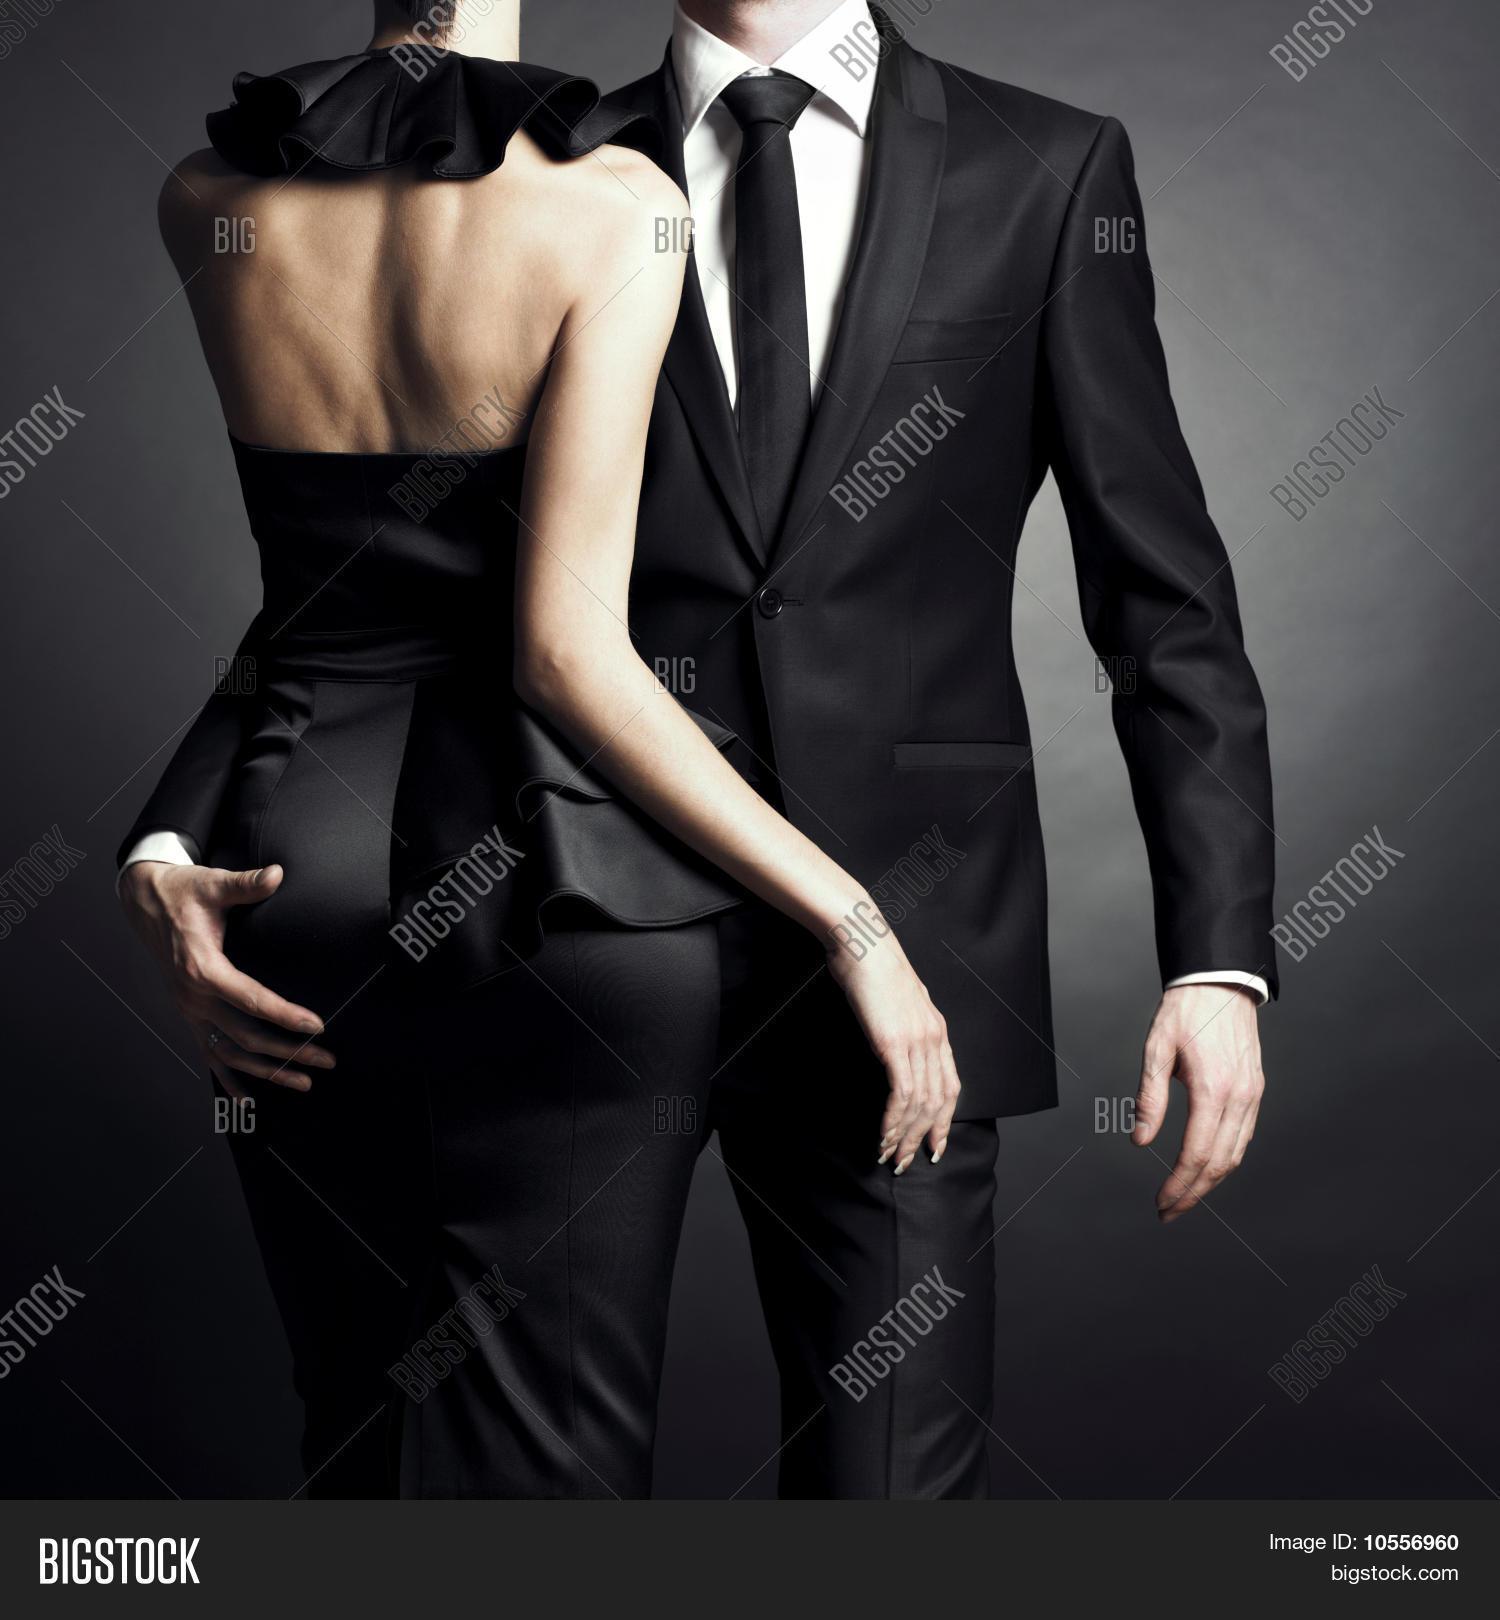 3771b2e1c977f Conceptual portrait of a young couple in elegant evening dresses